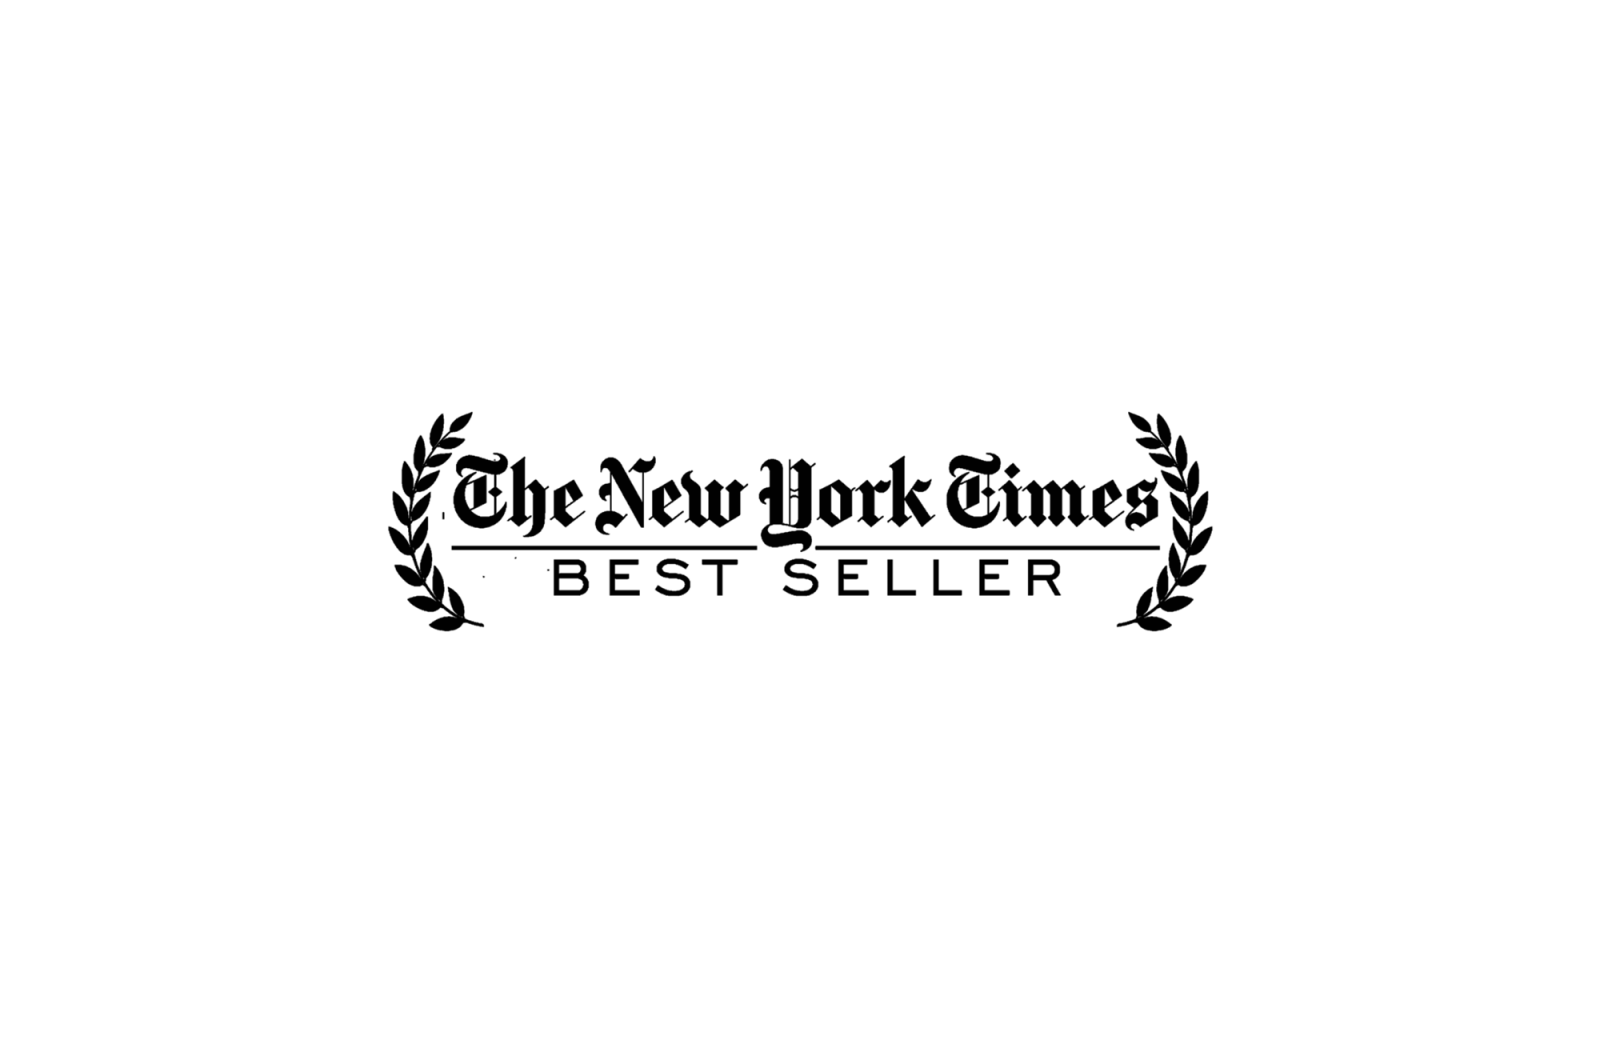 The New York Times Bestseller logo on white background